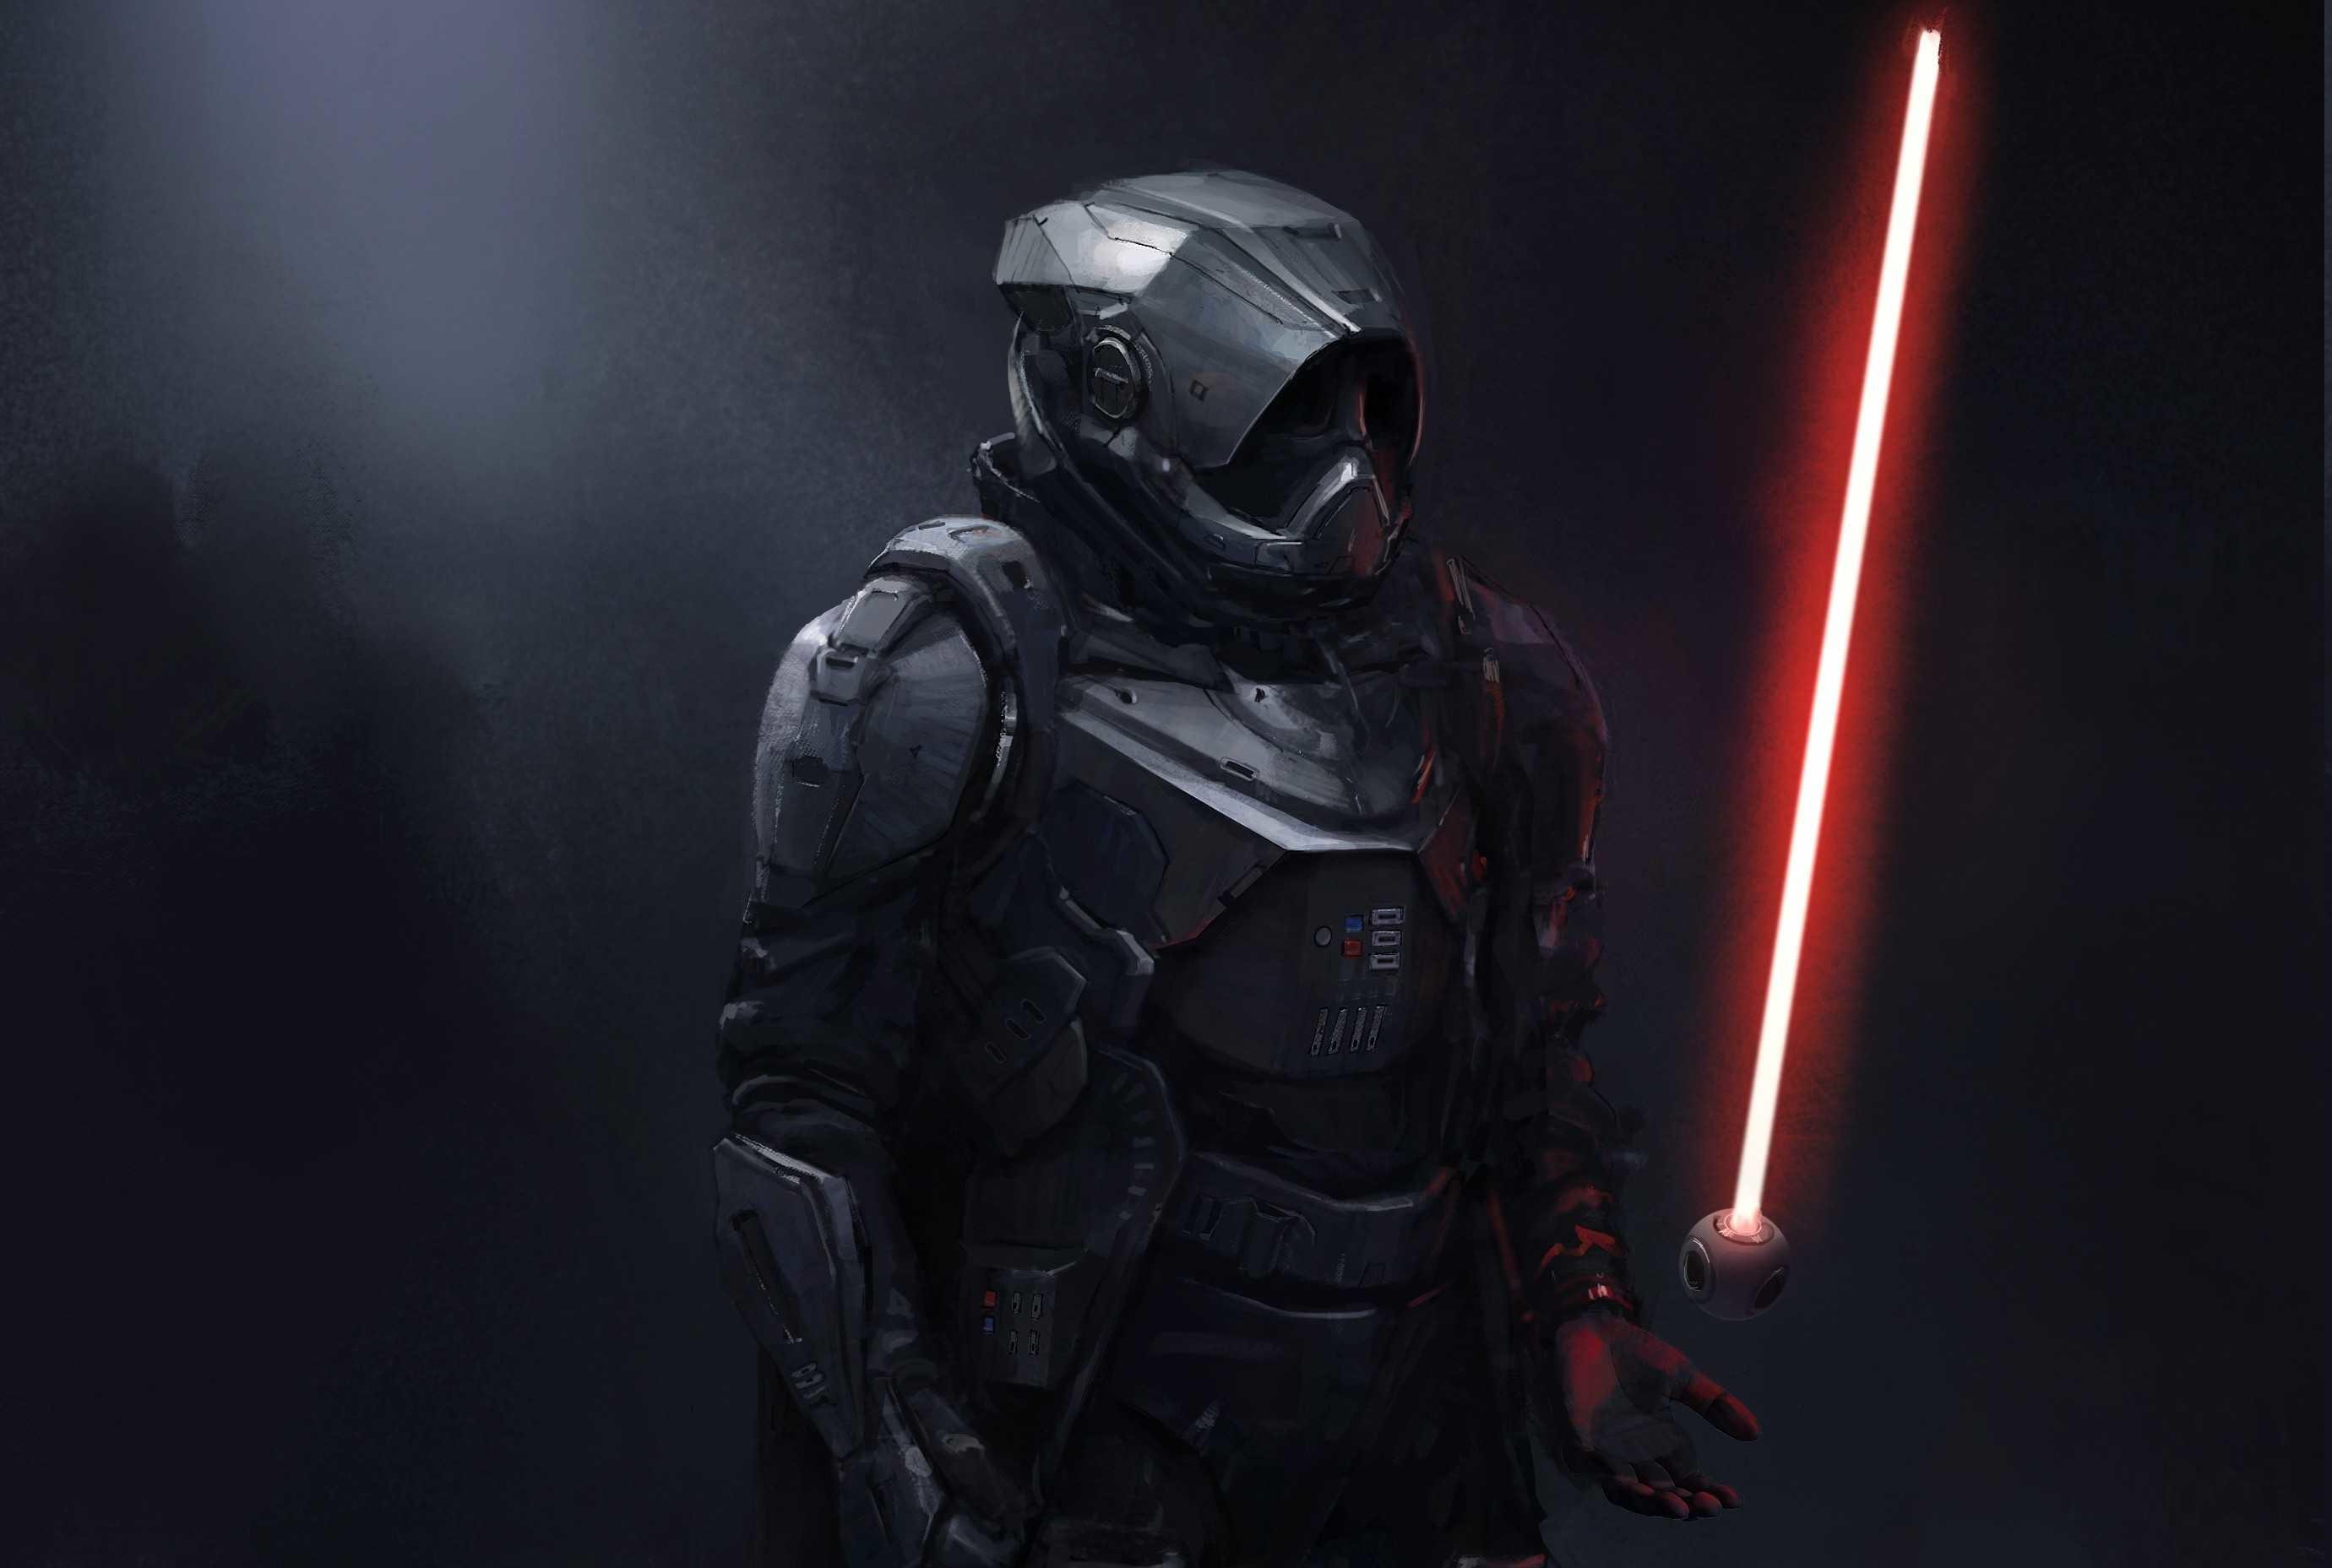 Res: 2761x1857, Backgrounds Of Star Wars Sith Wallpaper Hd Resolution Cinema Full Pics  Desktop